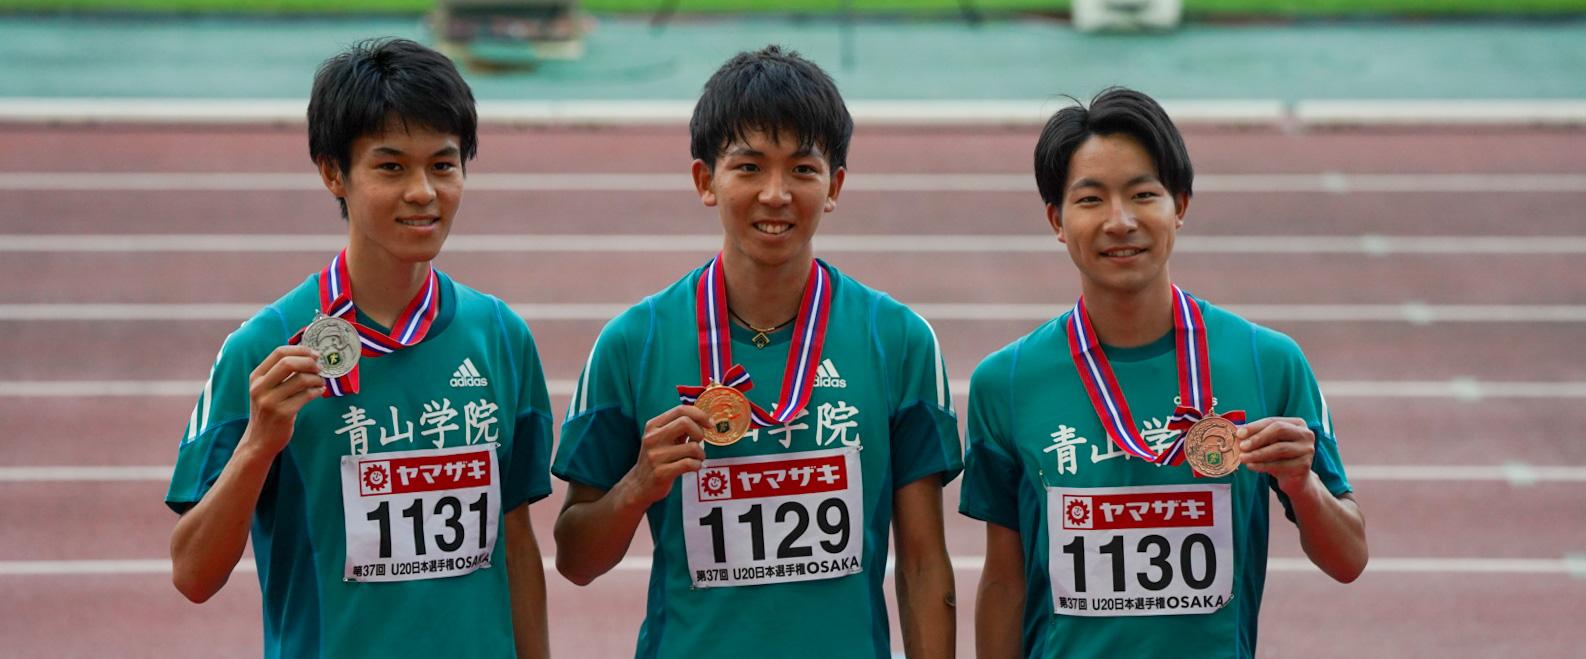 U20日本選手権の男子5000mで青学大が表彰台を独占!